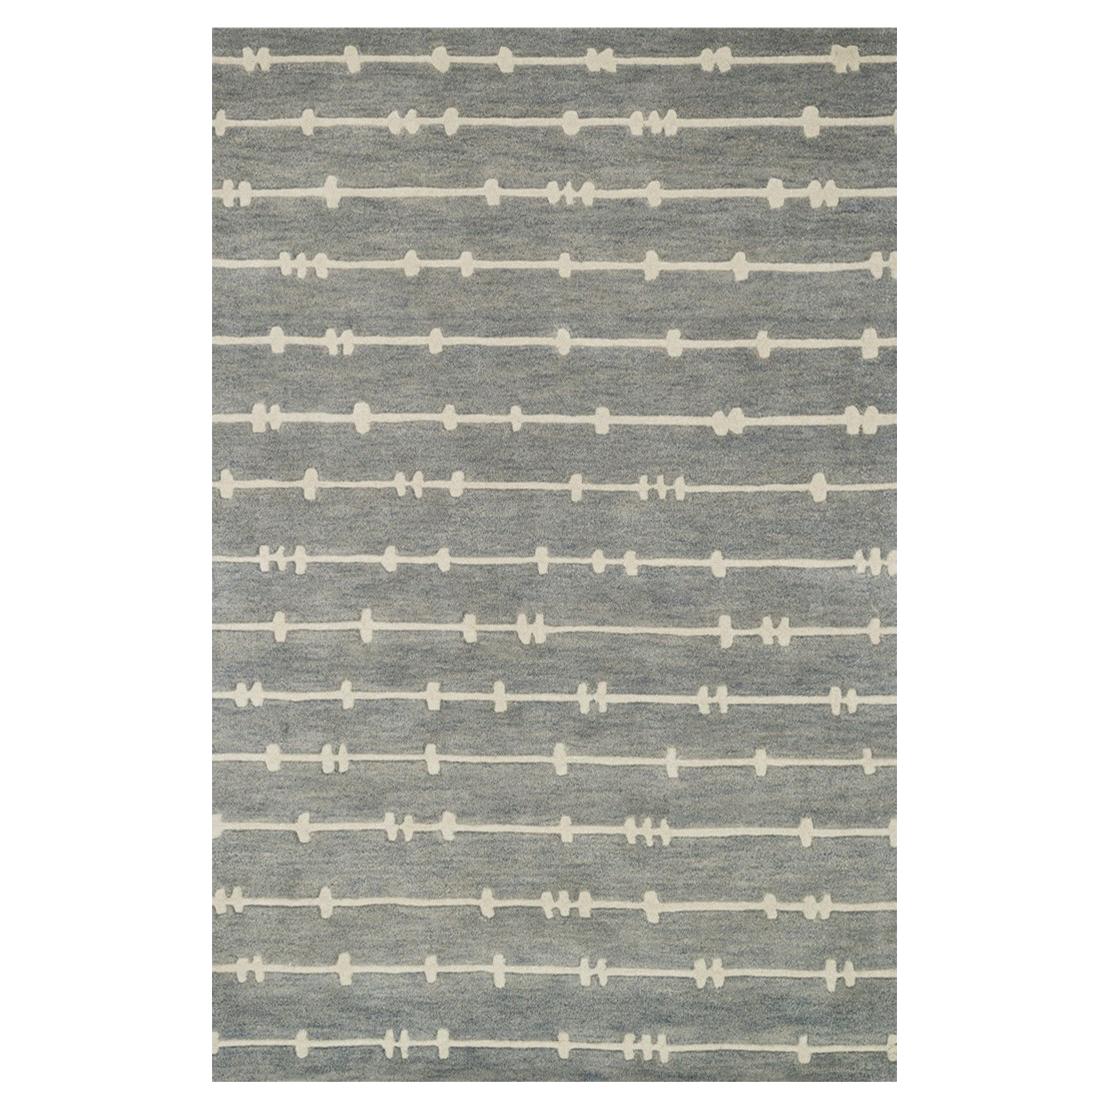 Mondo Modern Grey Ivory Wire Wool Rug - 7'10x11